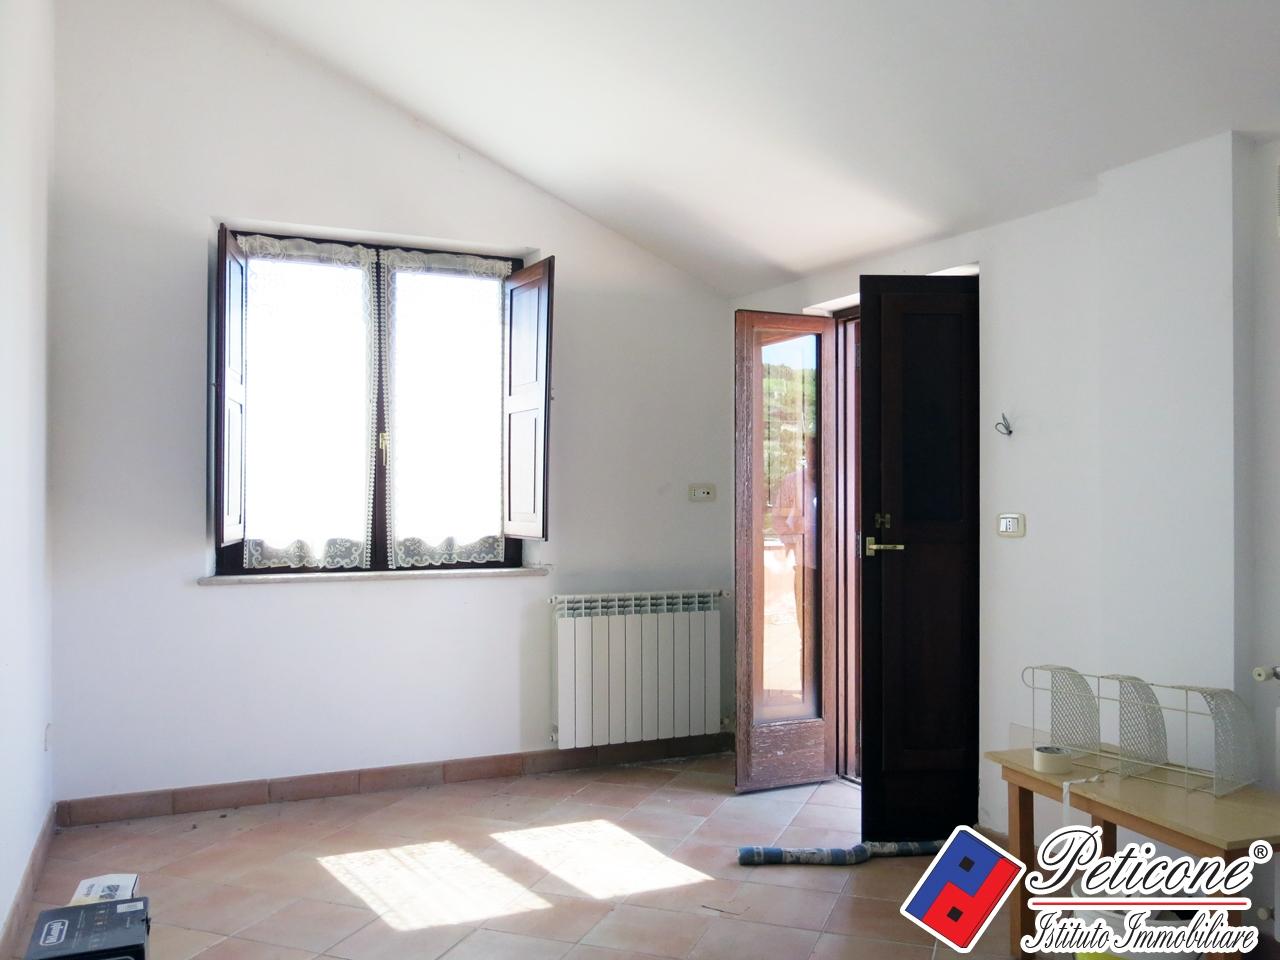 Villa in Vendita a Gaeta: 5 locali, 250 mq - Foto 12